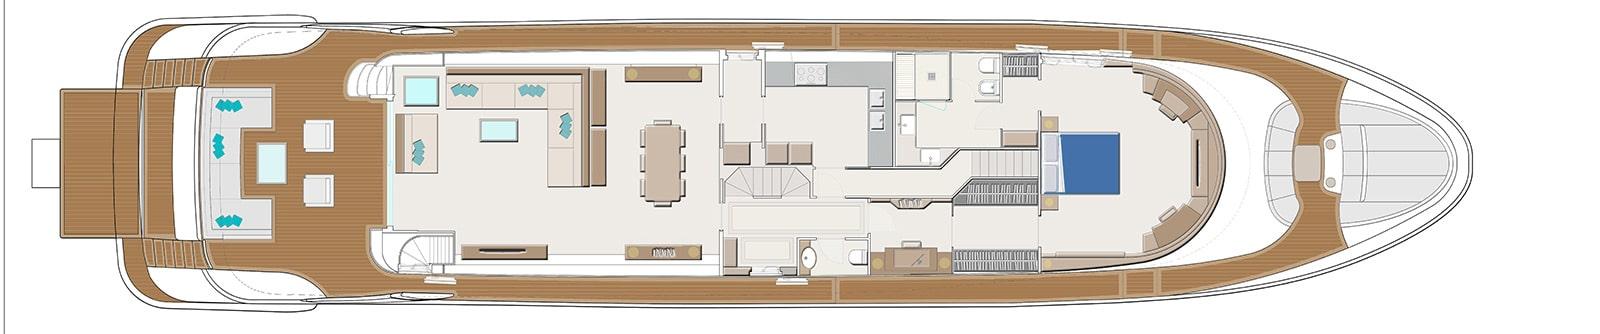 Navetta 35 metri - Main Deck